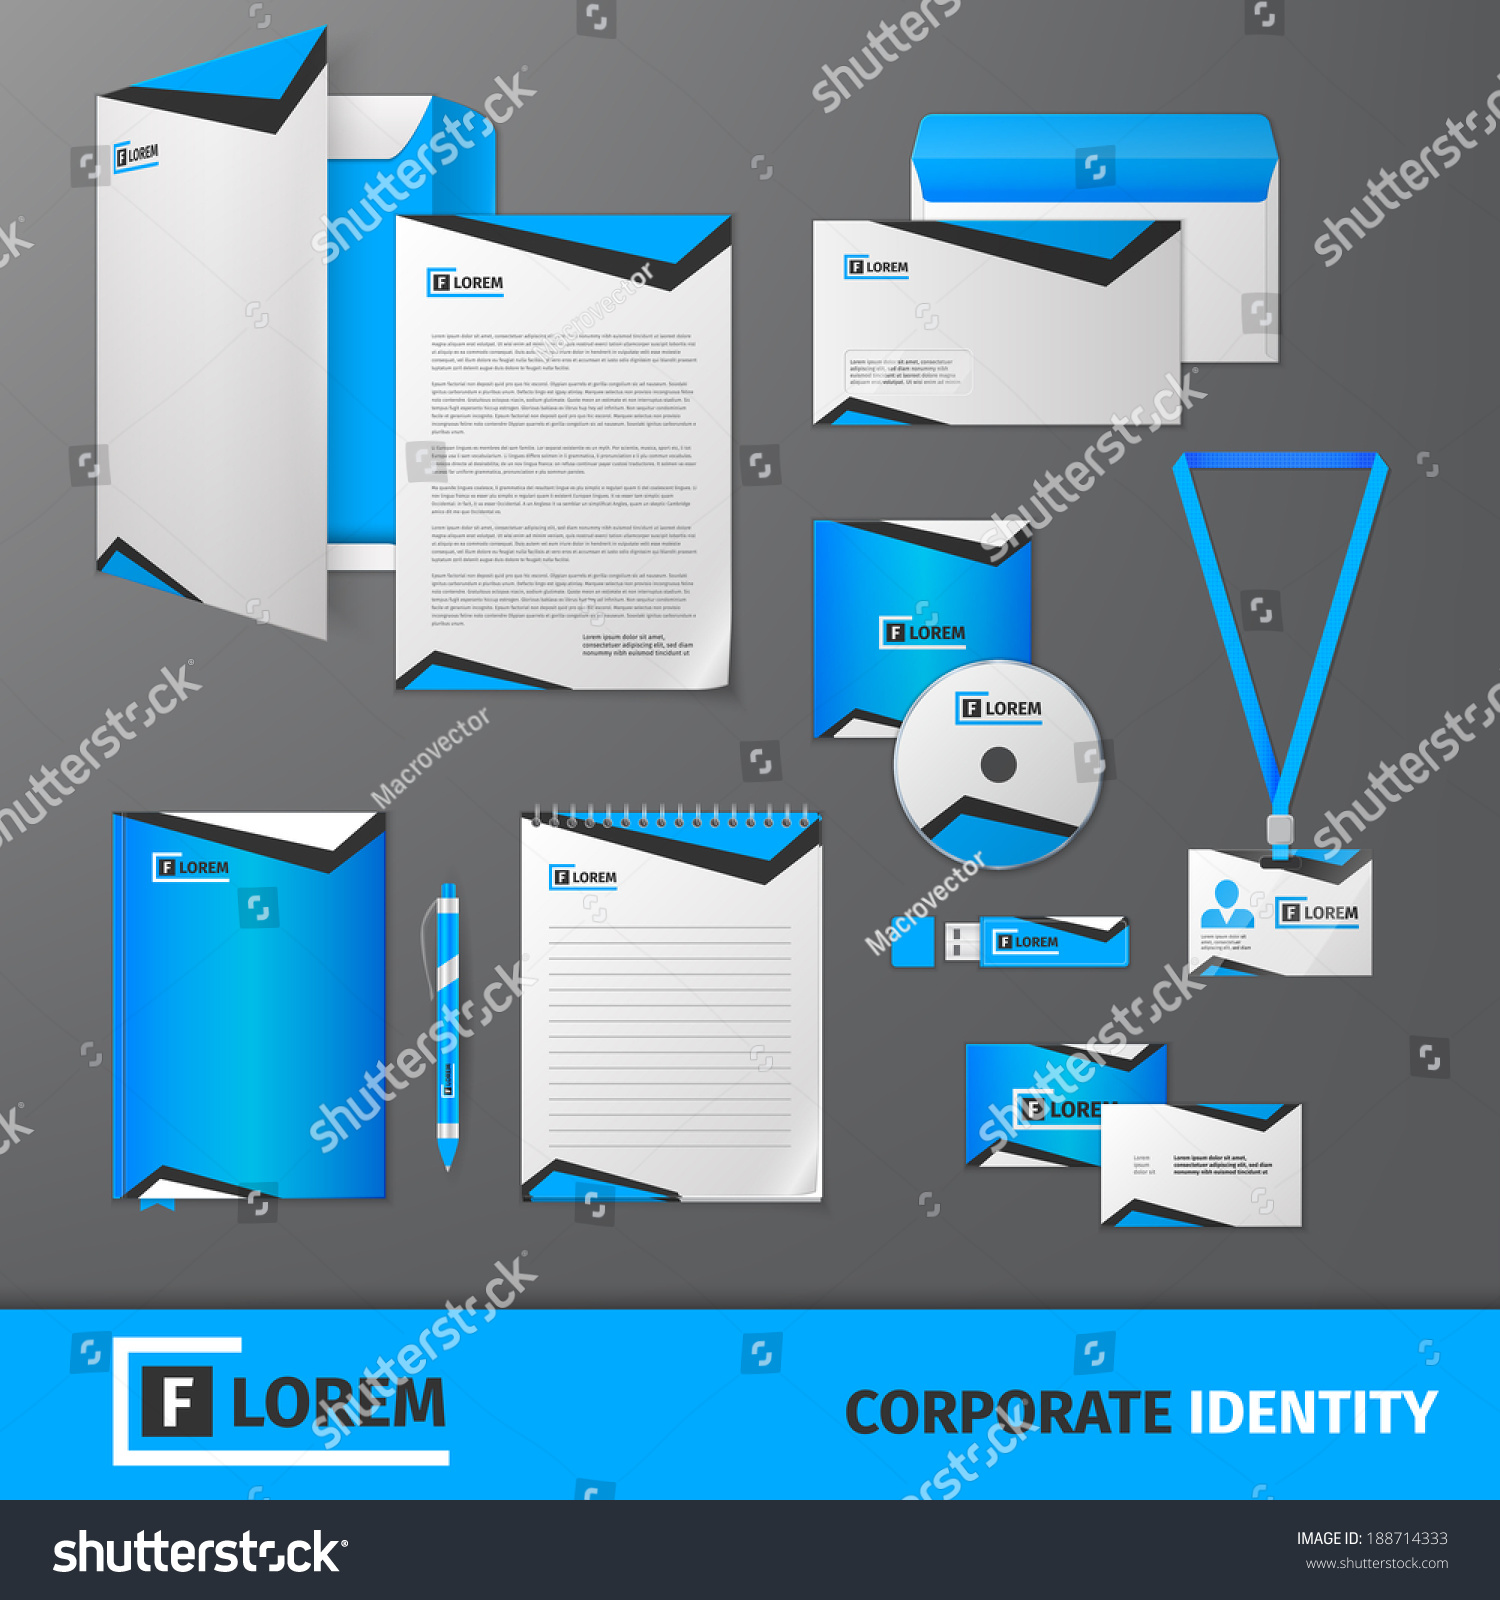 Corporate Stationery: Blue Geometric Technology Business Stationery Template